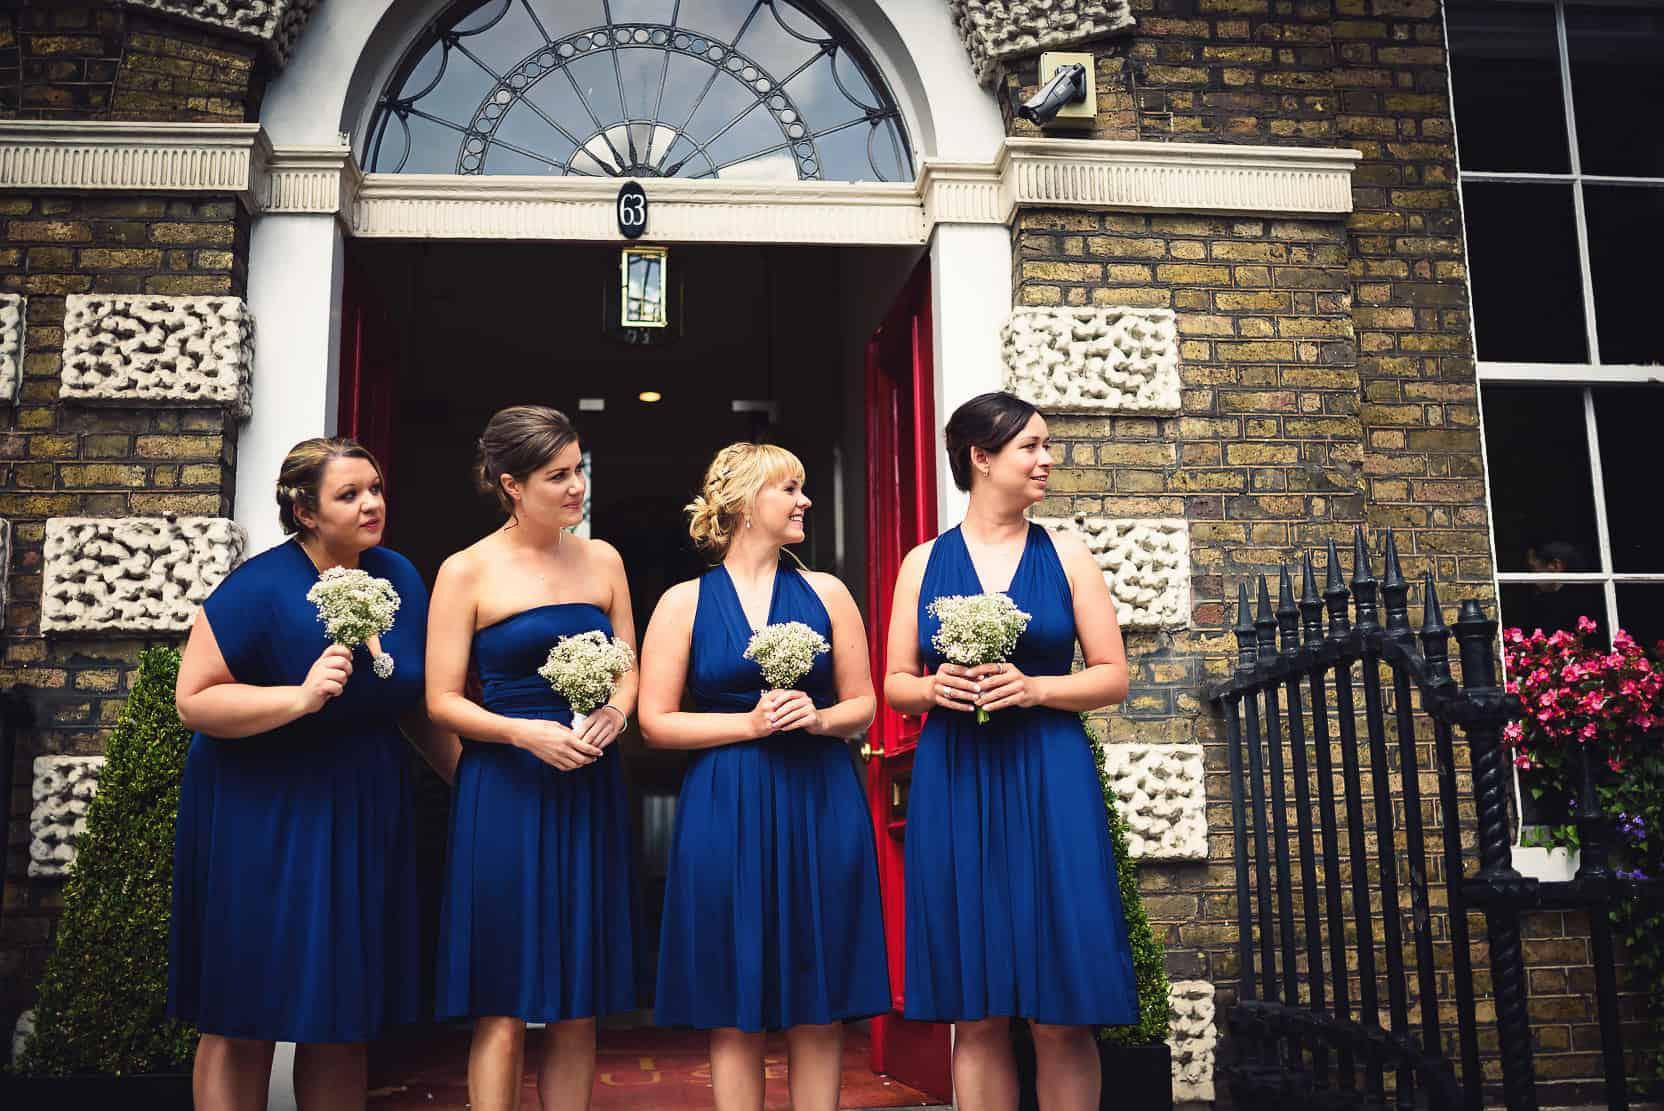 wedding_photography_asia_house_london_ld_justin_bailey_photography_003